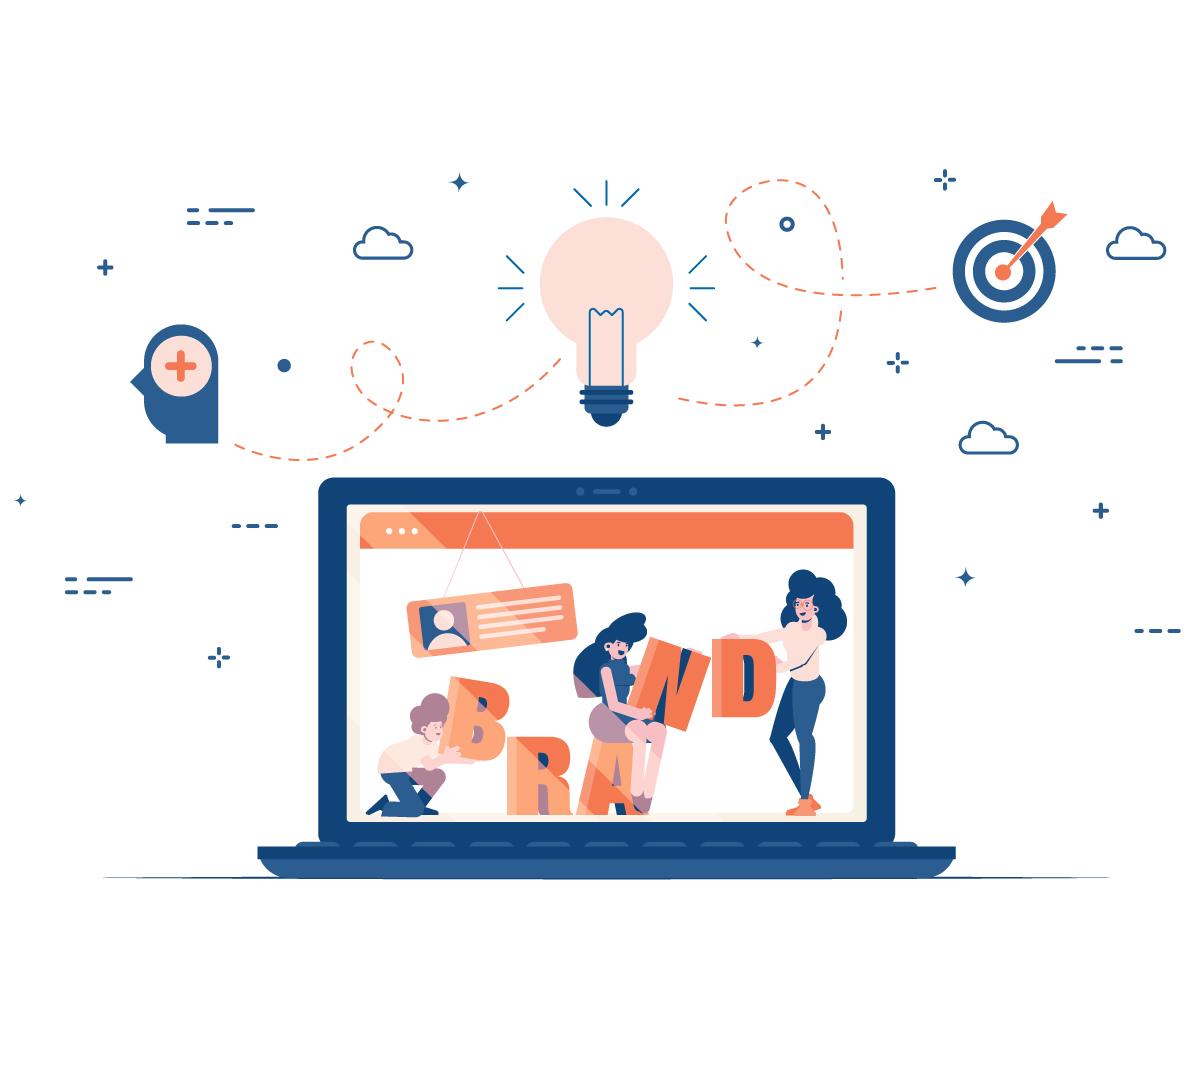 web bespoke development company surrey - Digital Marketing